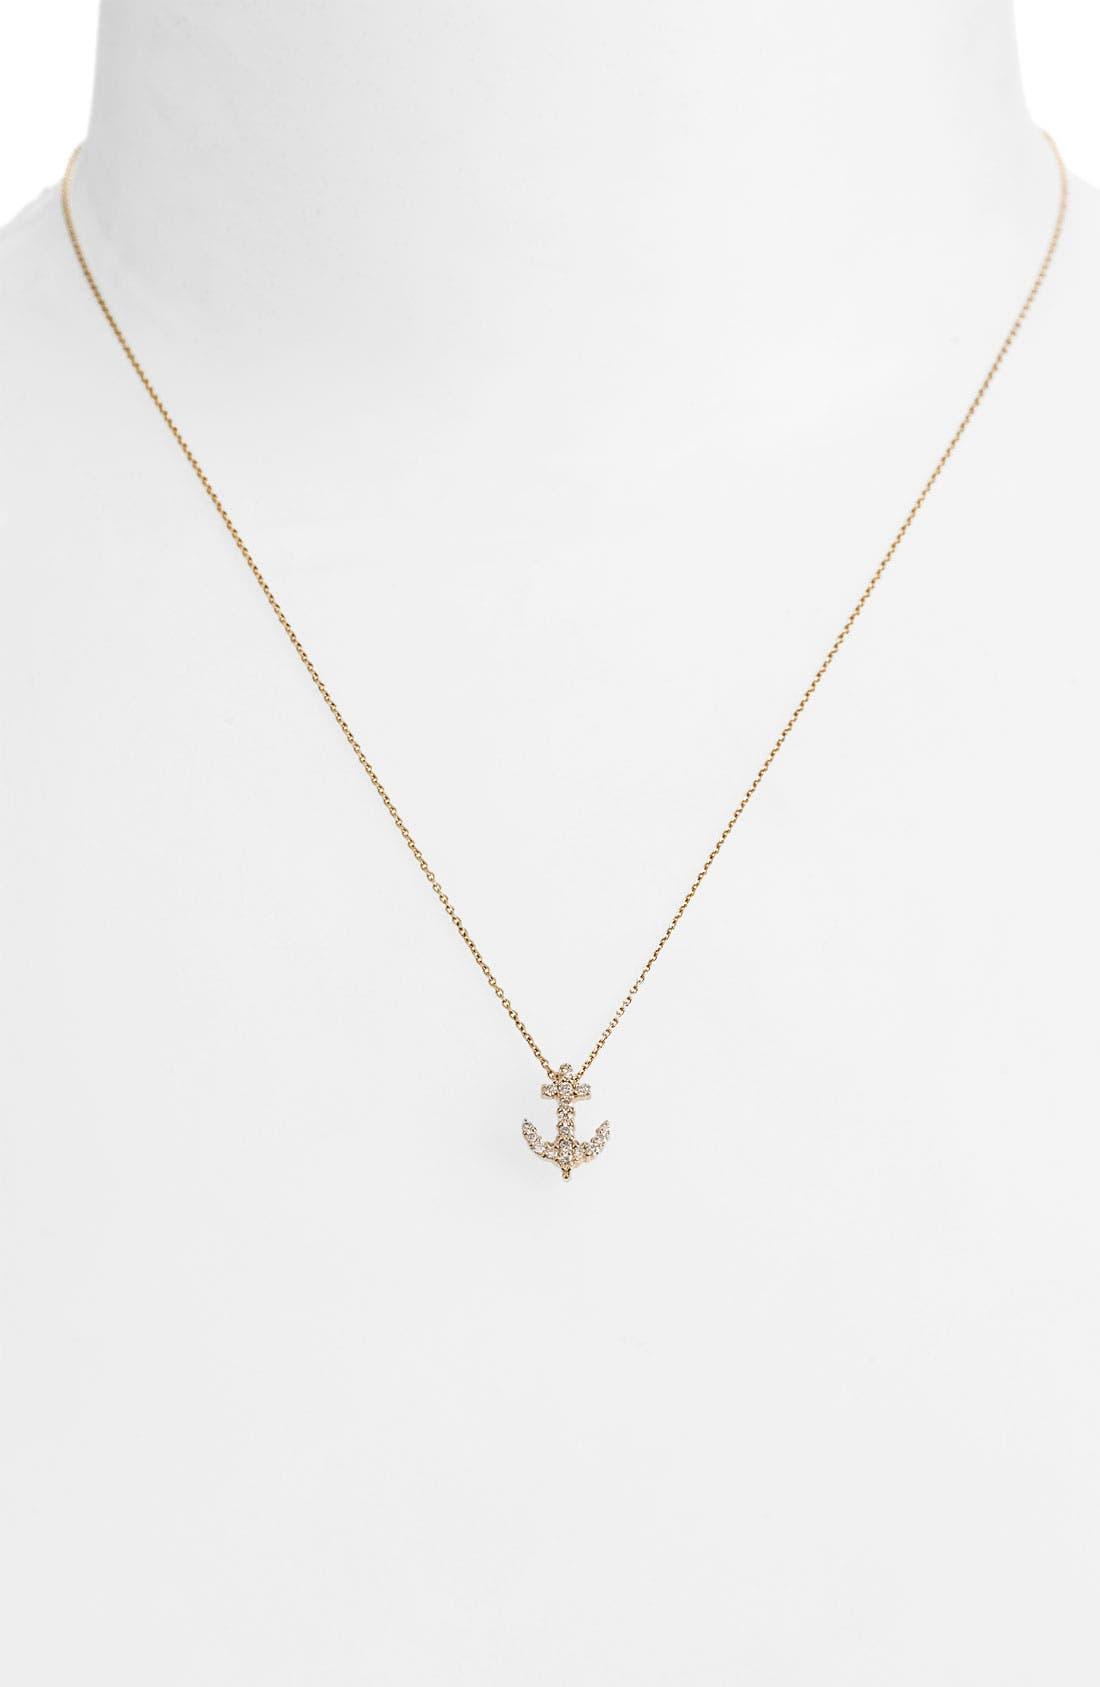 Main Image - Roberto Coin 'Tiny Treasures' Baby Anchor Necklace